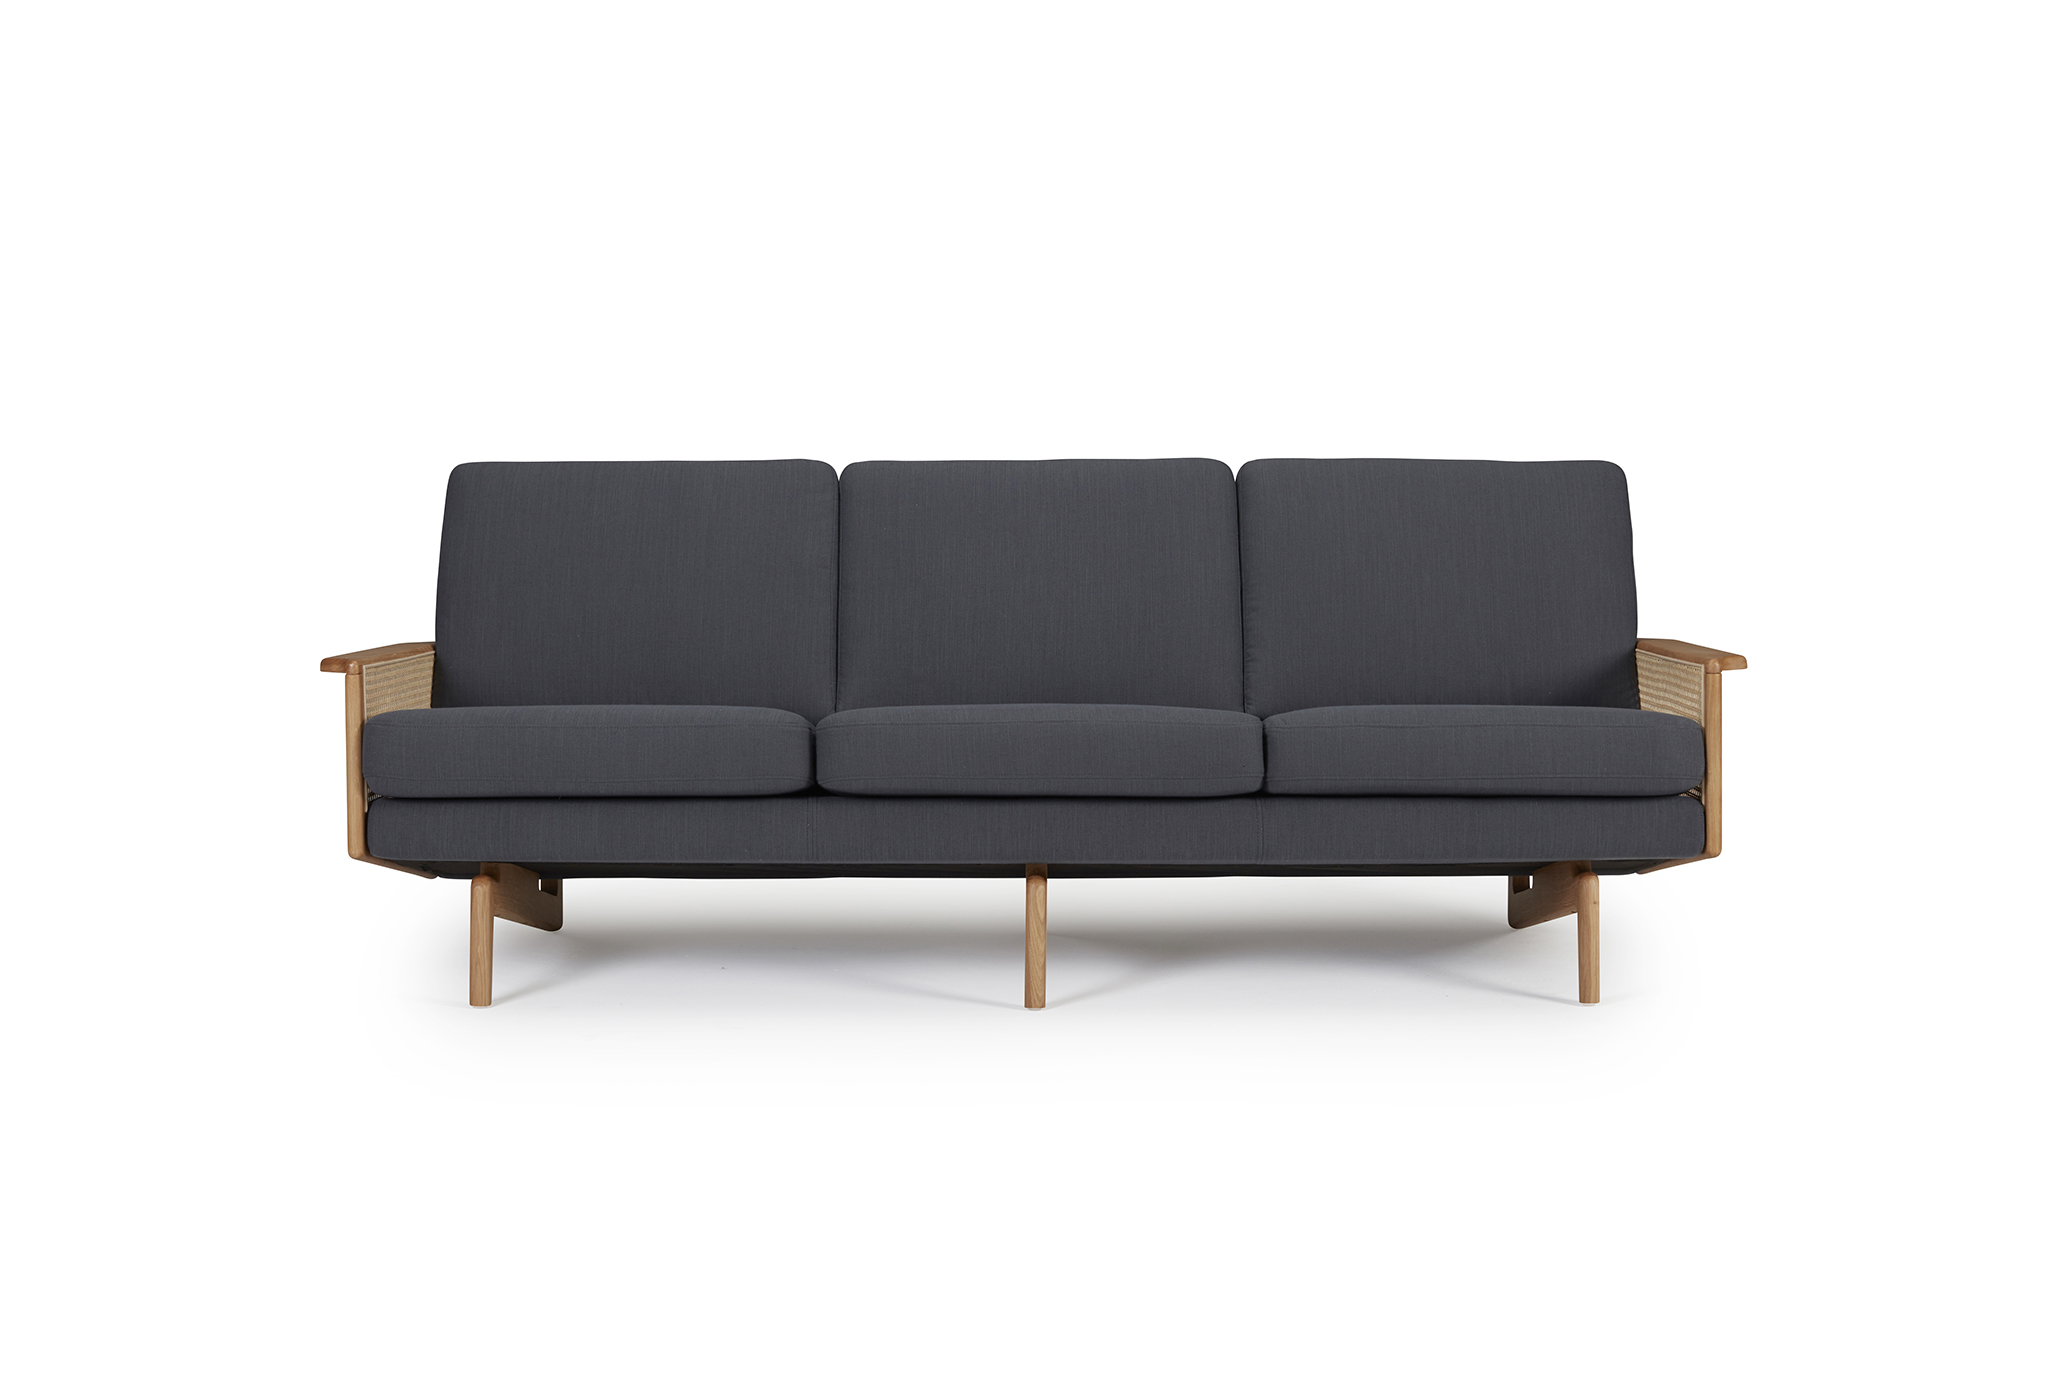 egsmark-sofa-cane-web-oliver-lukas-weisskrogh-7.jpg